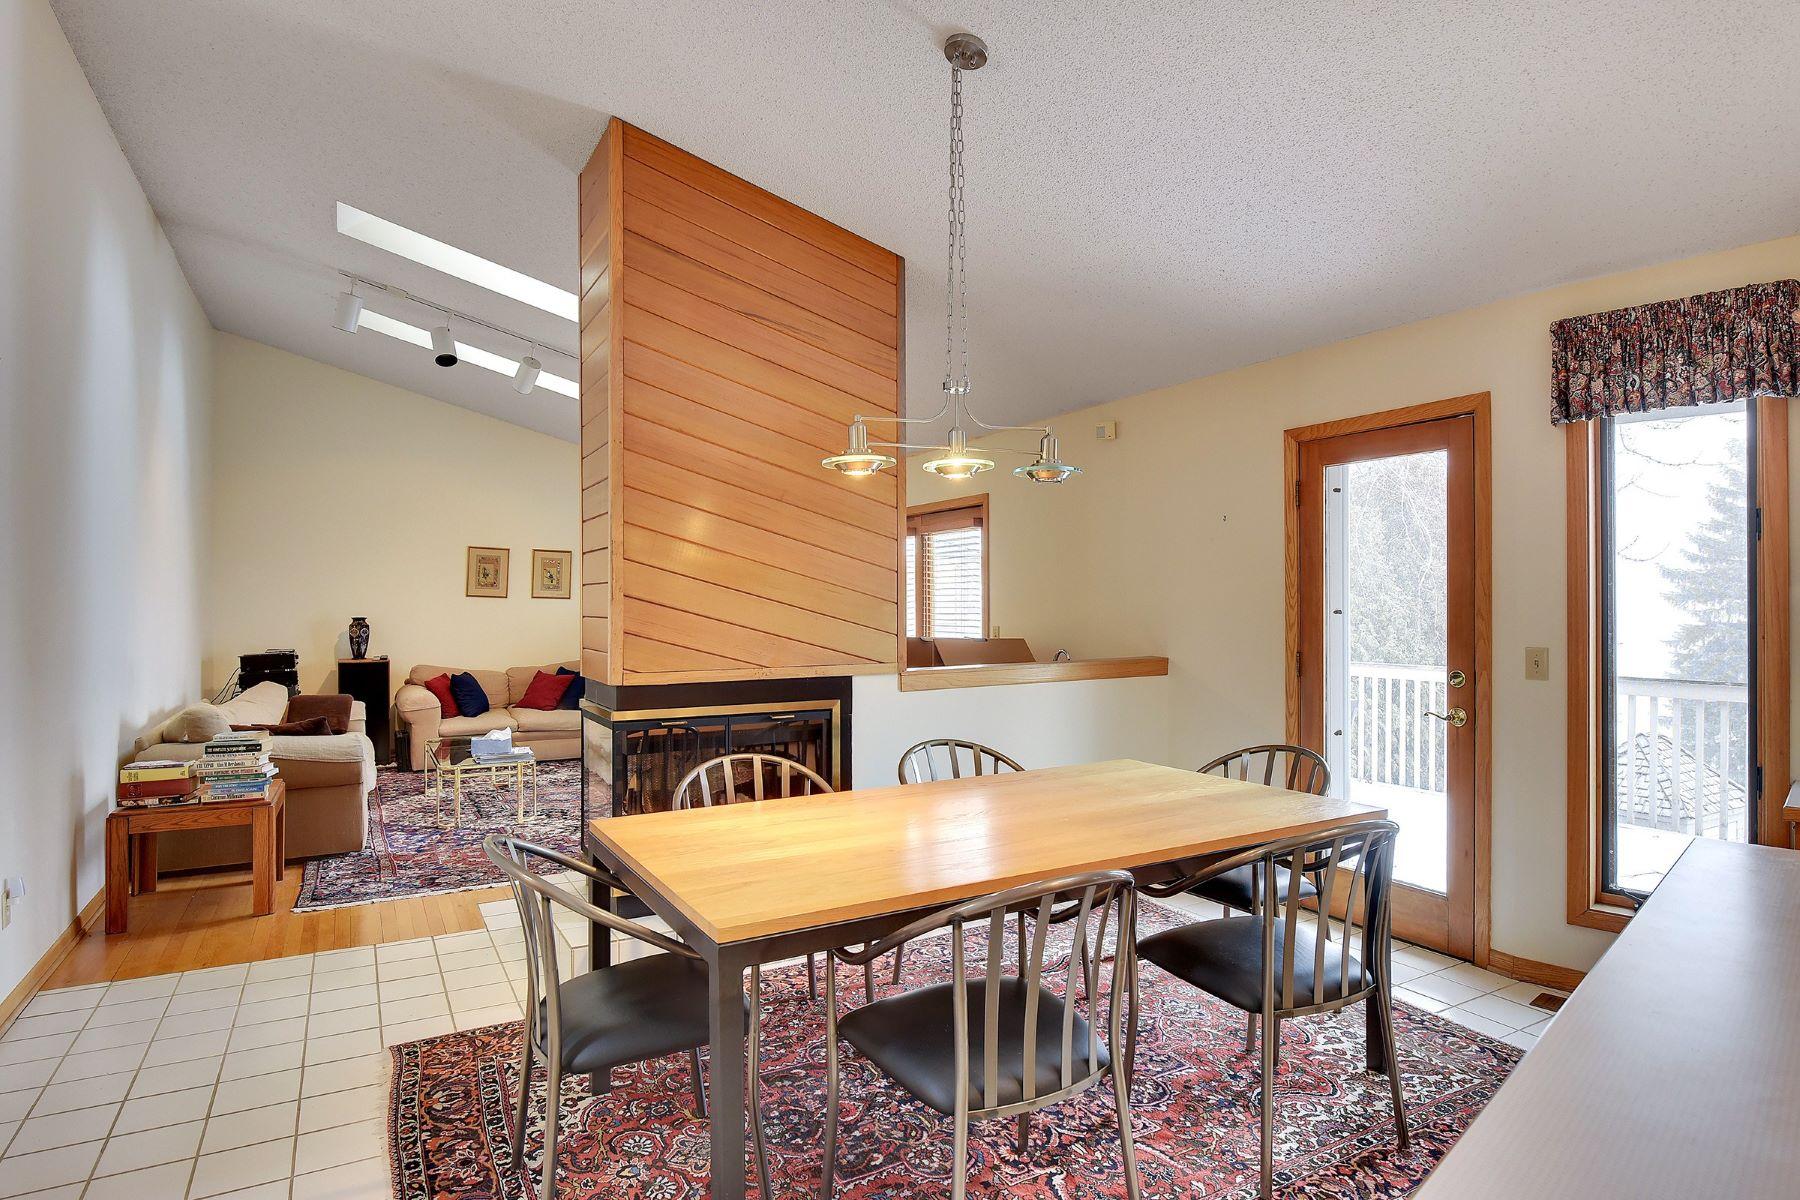 Single Family Home for Sale at 6916 Hillside Lane Edina, Minnesota, 55439 United States